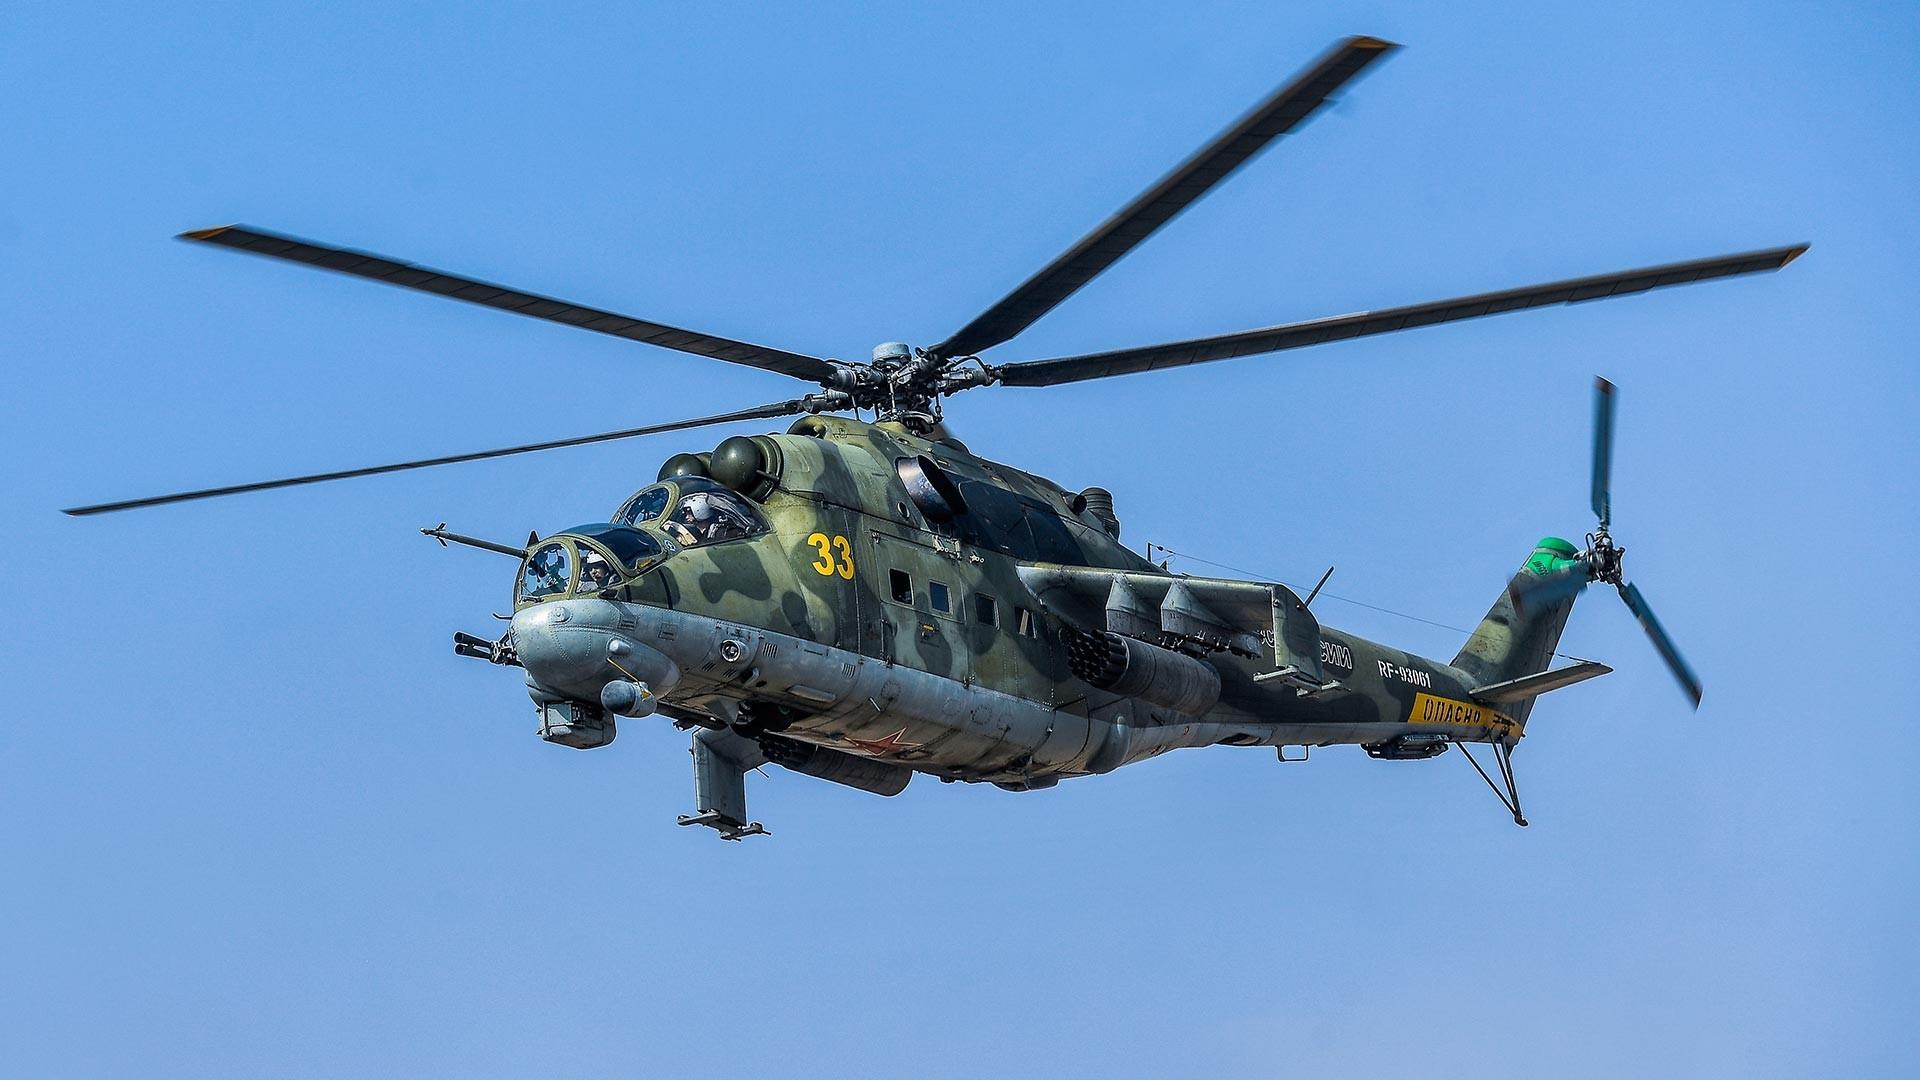 Јуришен хеликоптер Ми-24.